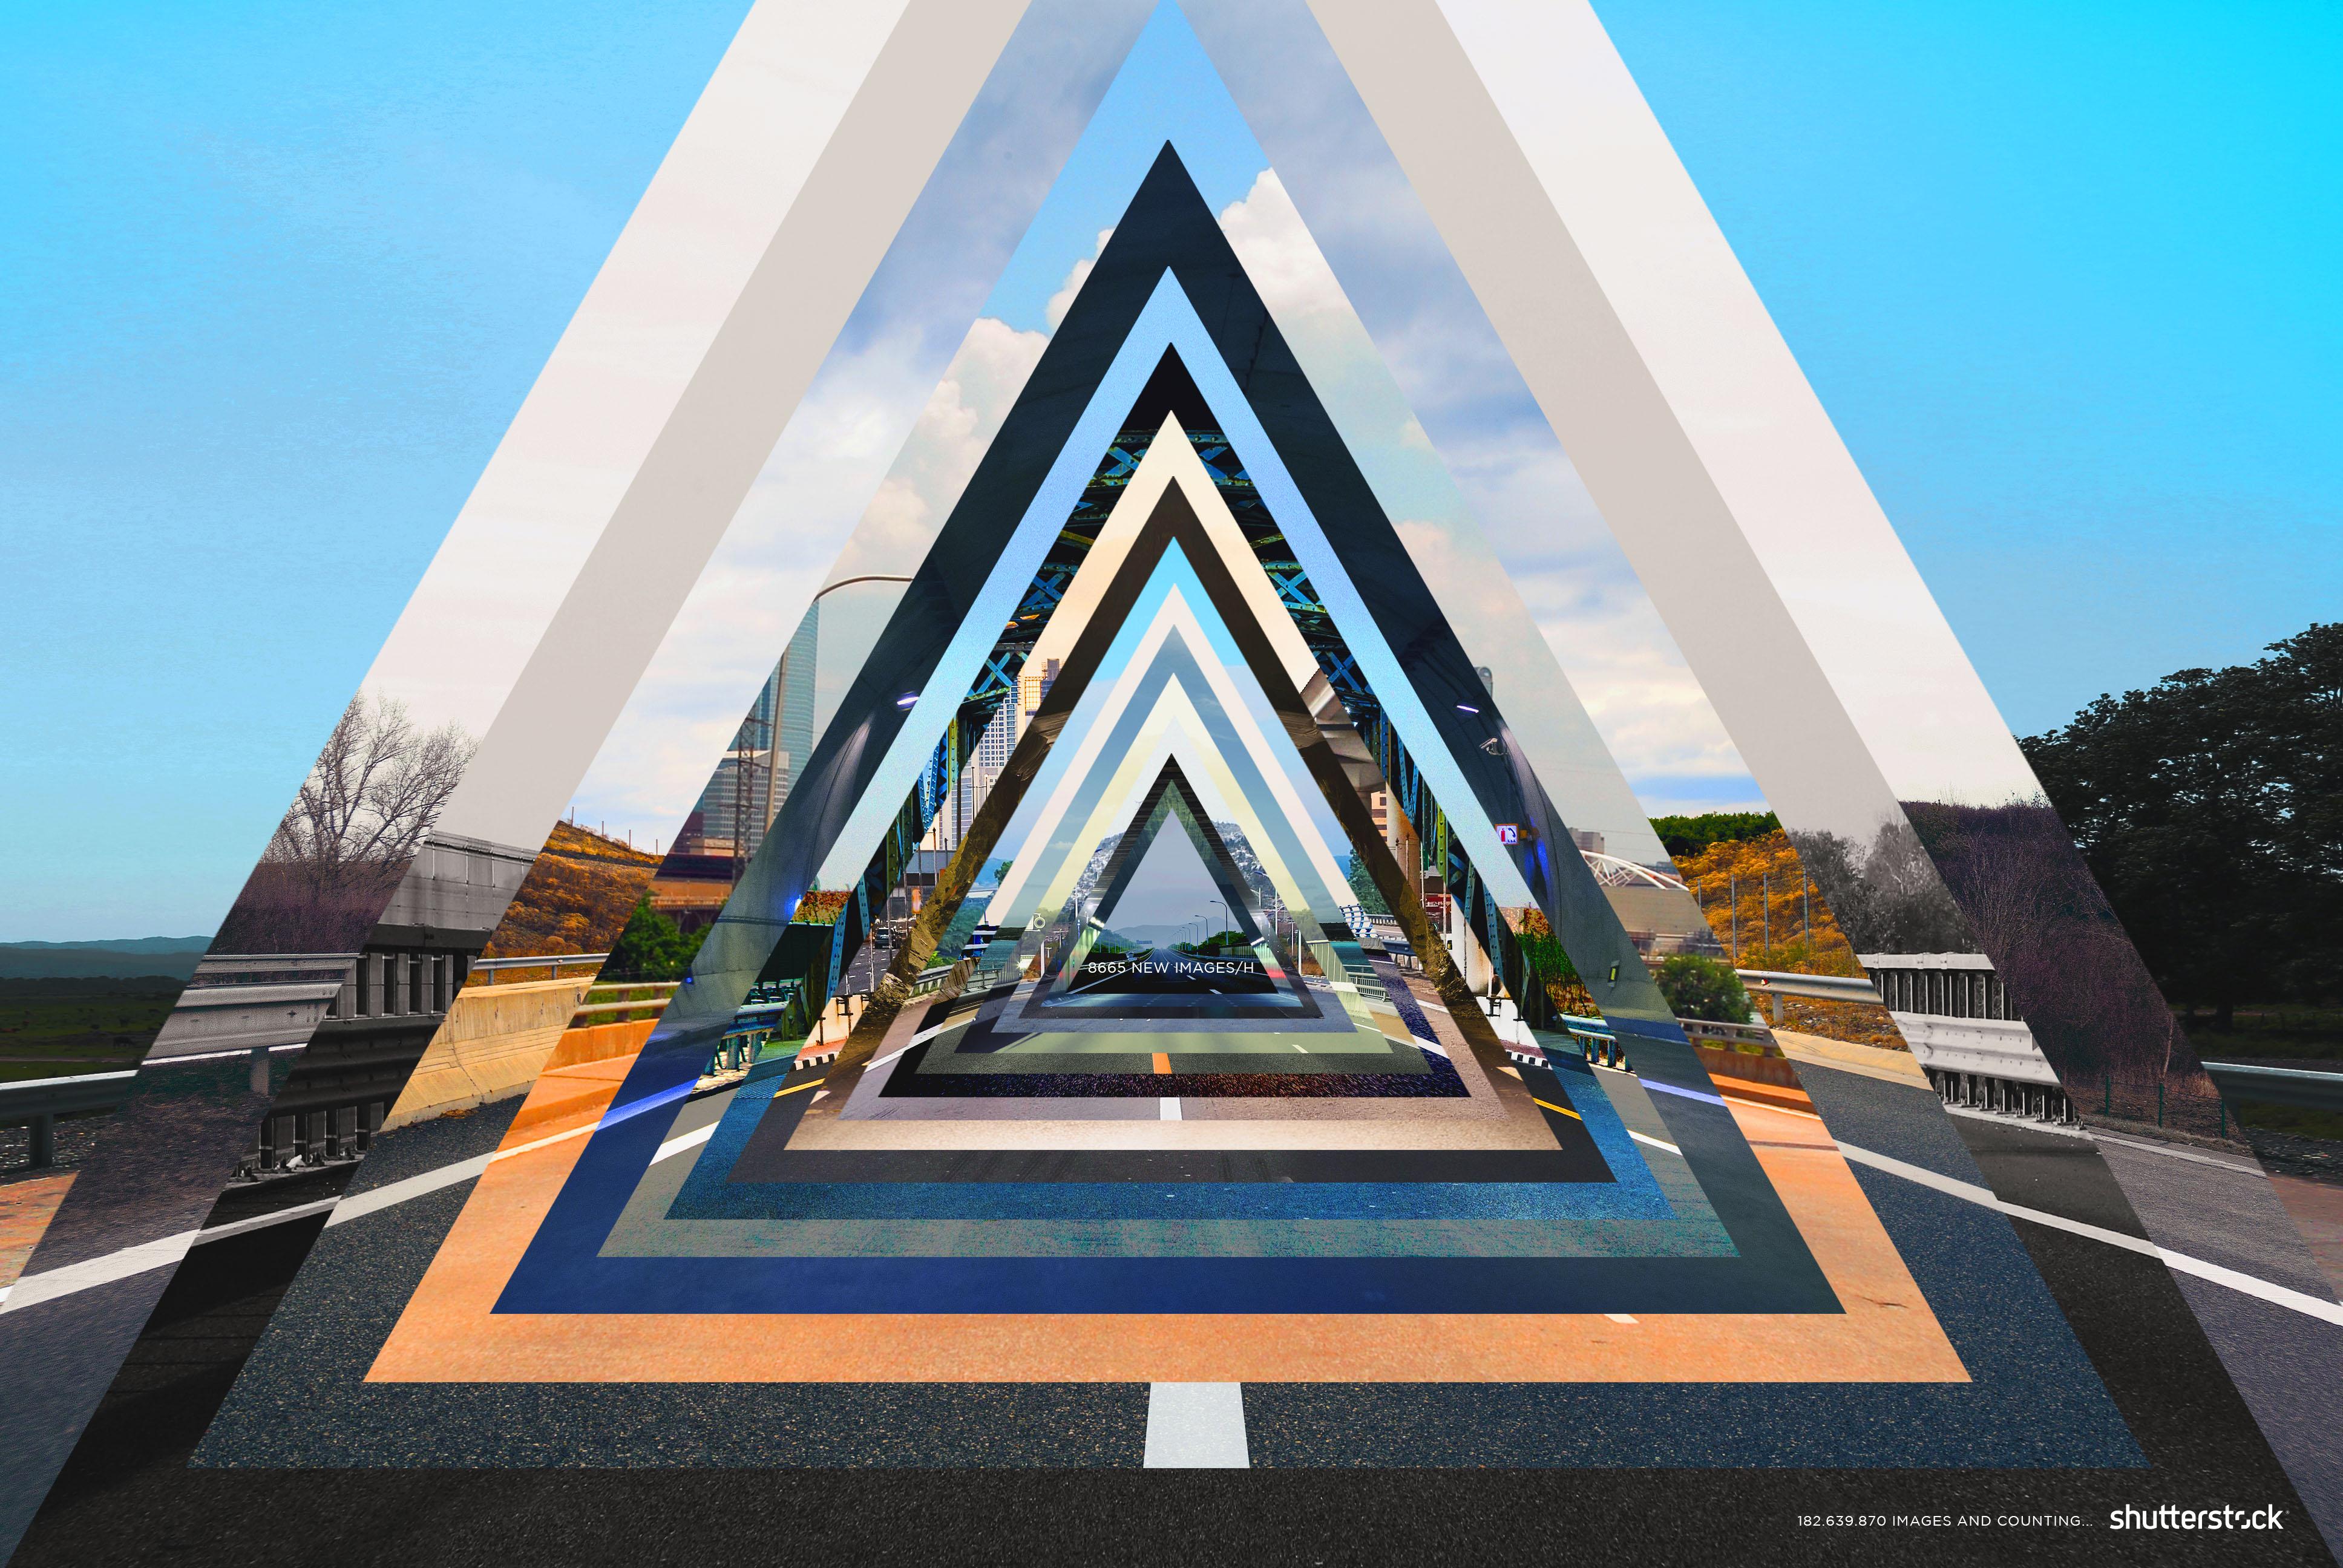 Shutterstock Print Advert By Mccann Triangles Ads Of